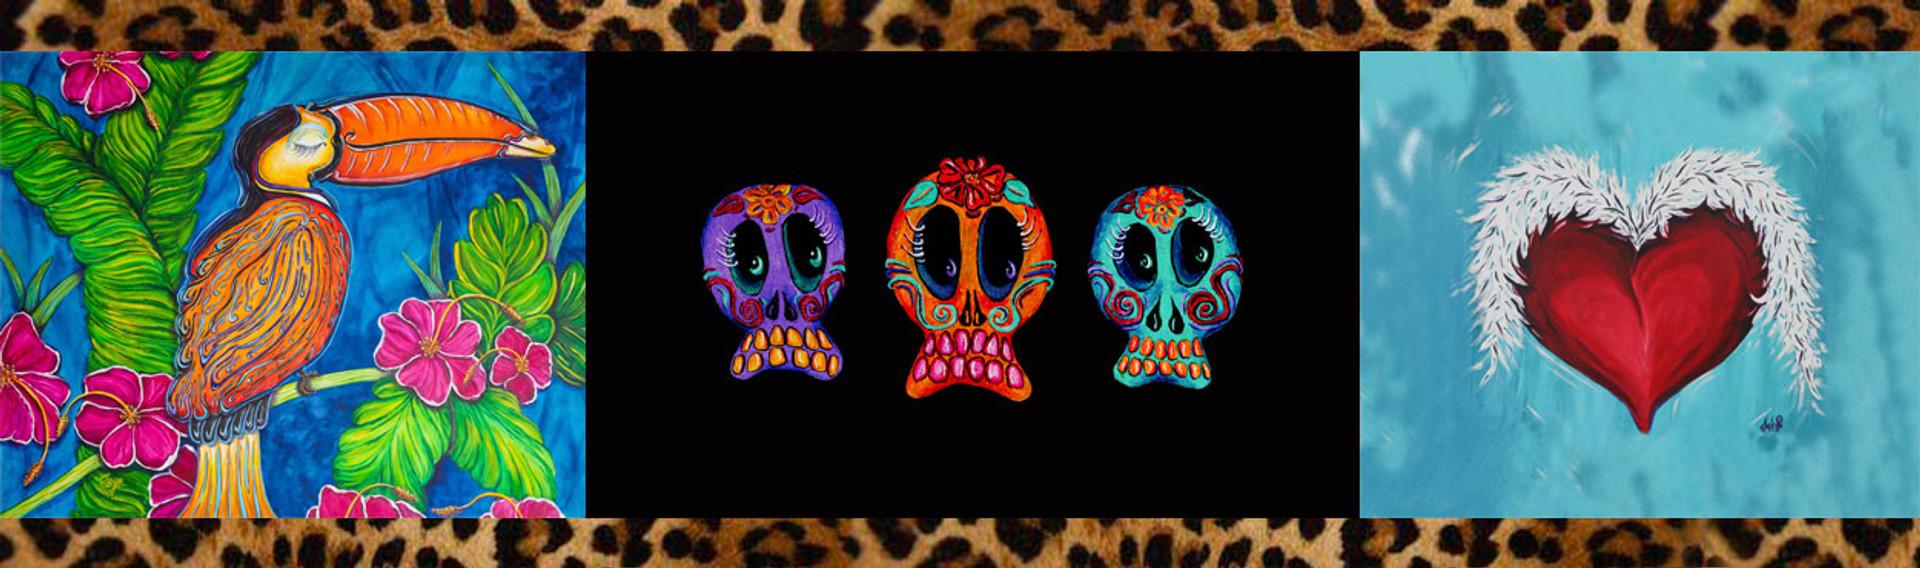 Enjoy our colorful art from Janet Edziak.